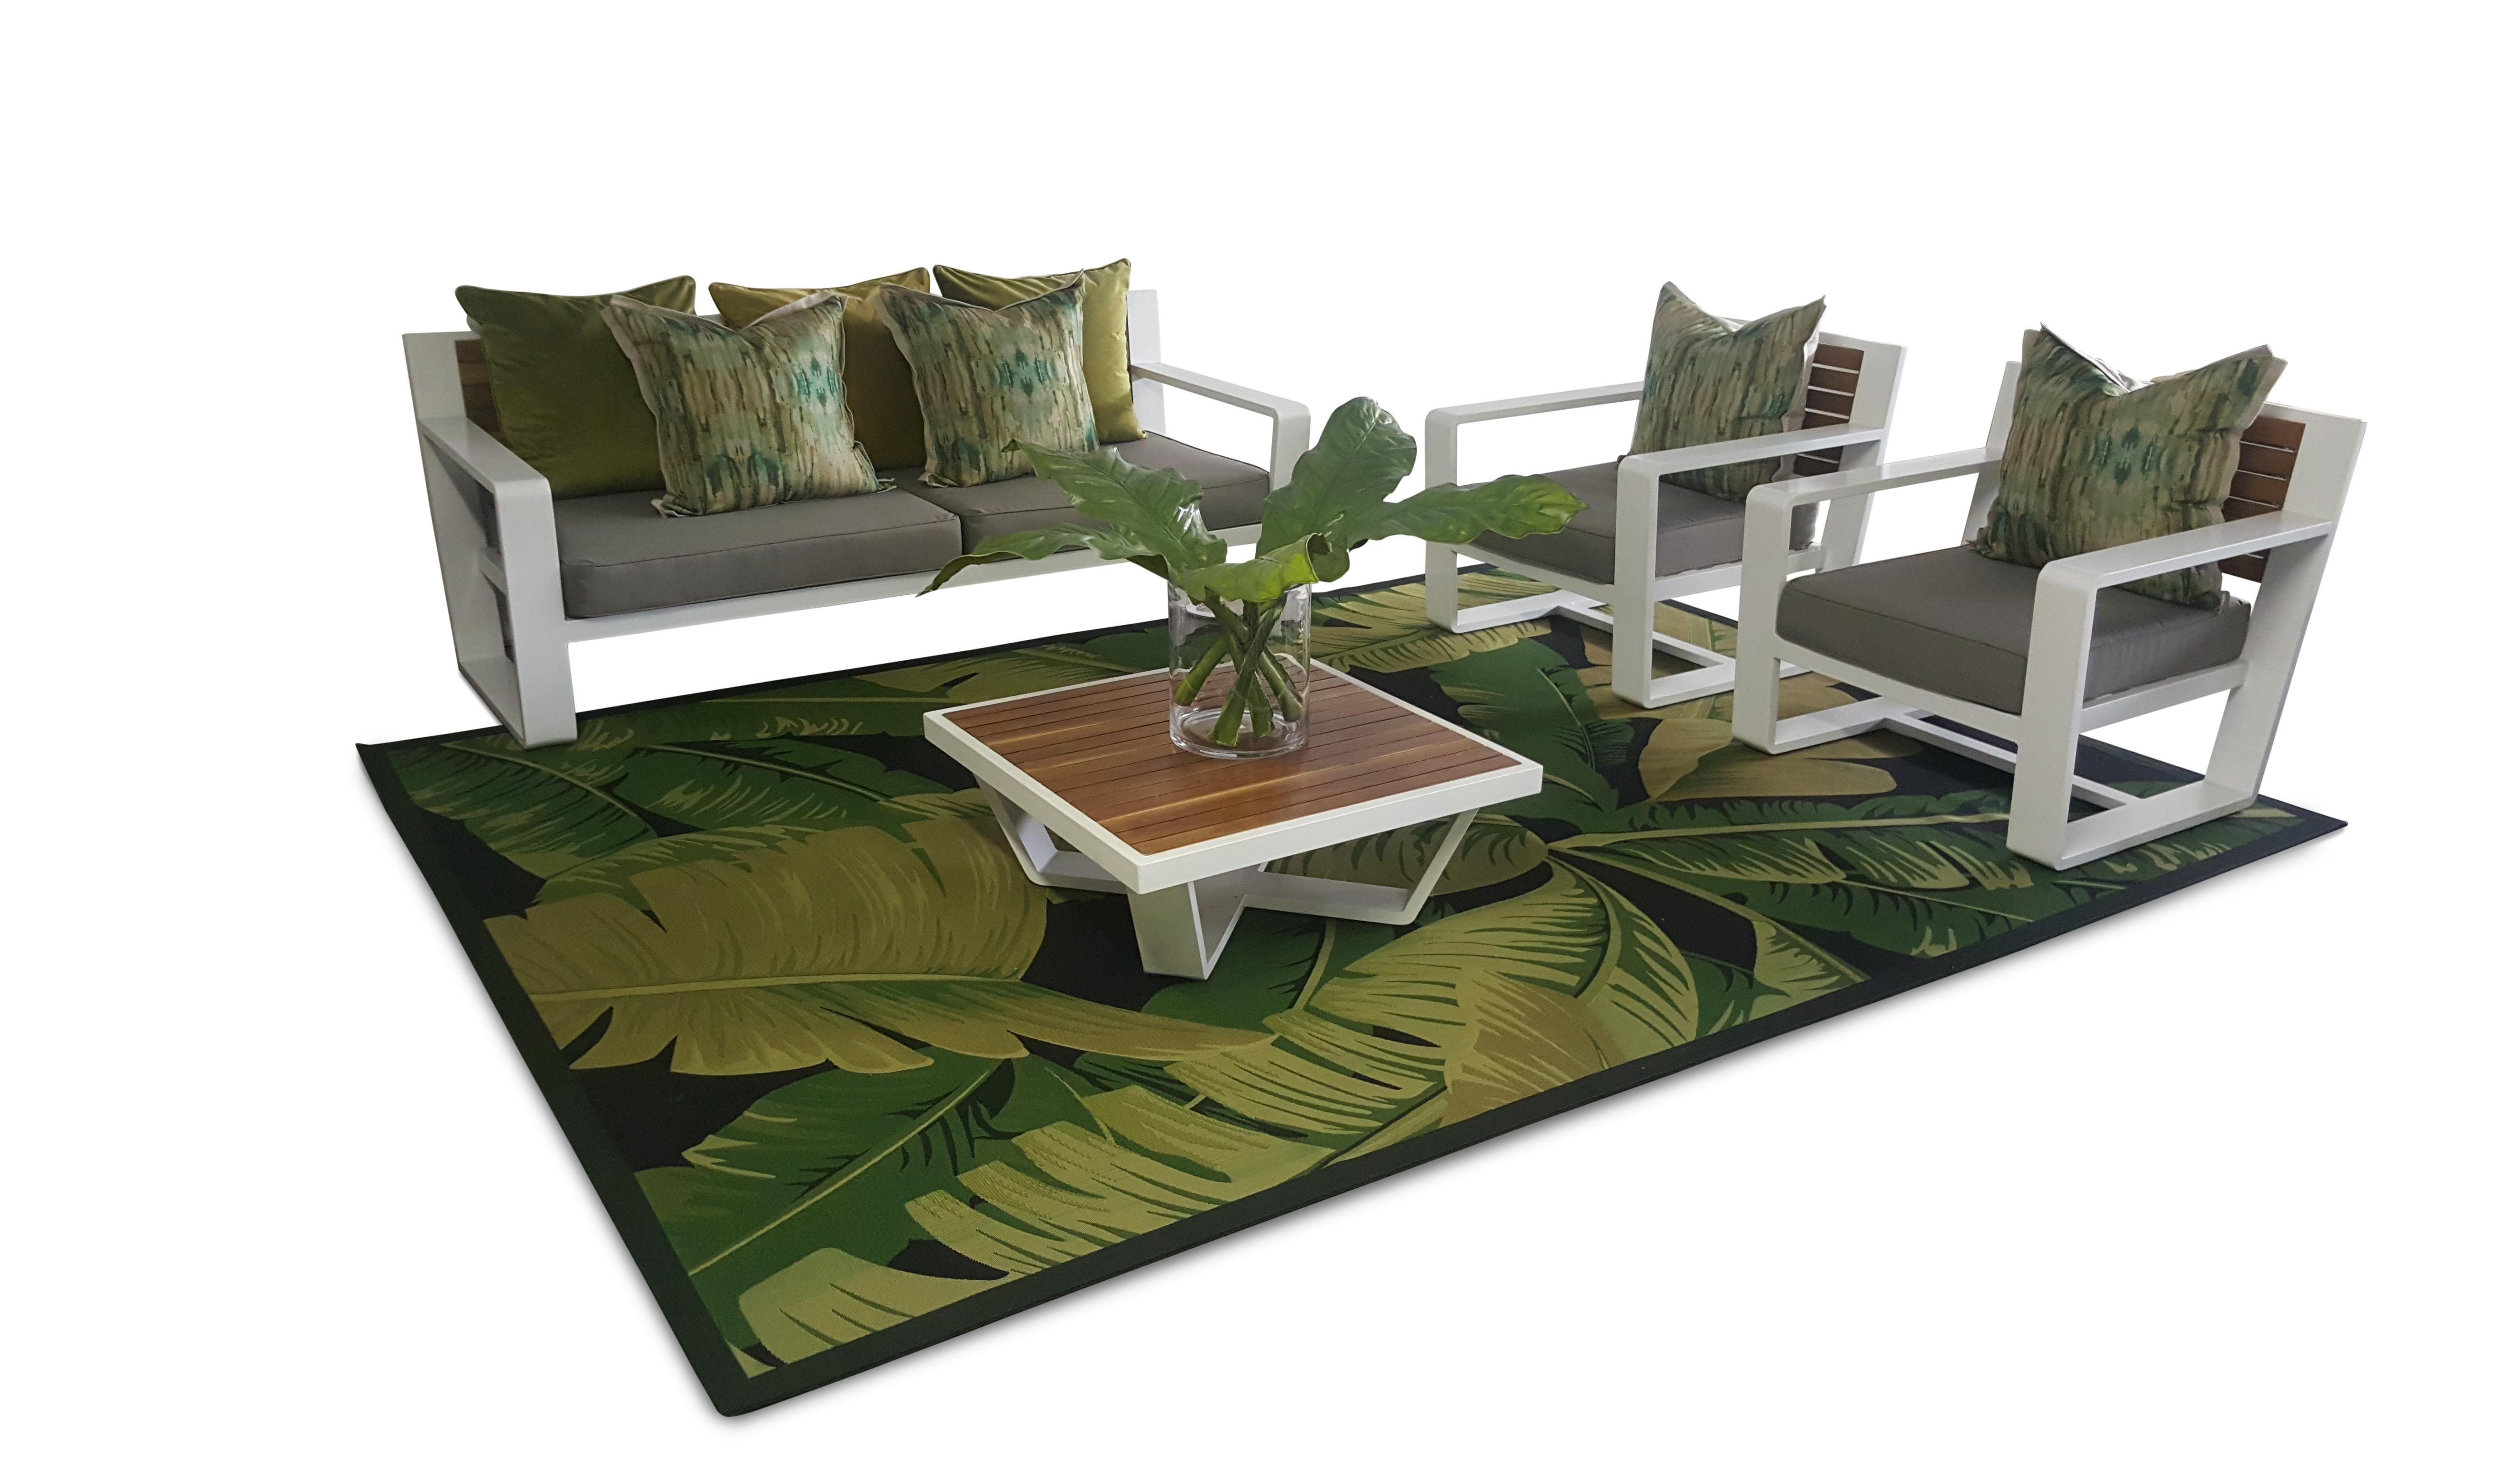 Patio Outdoor Furniture Tru Outdoor Luxury Africa inside size 5312 X 3118